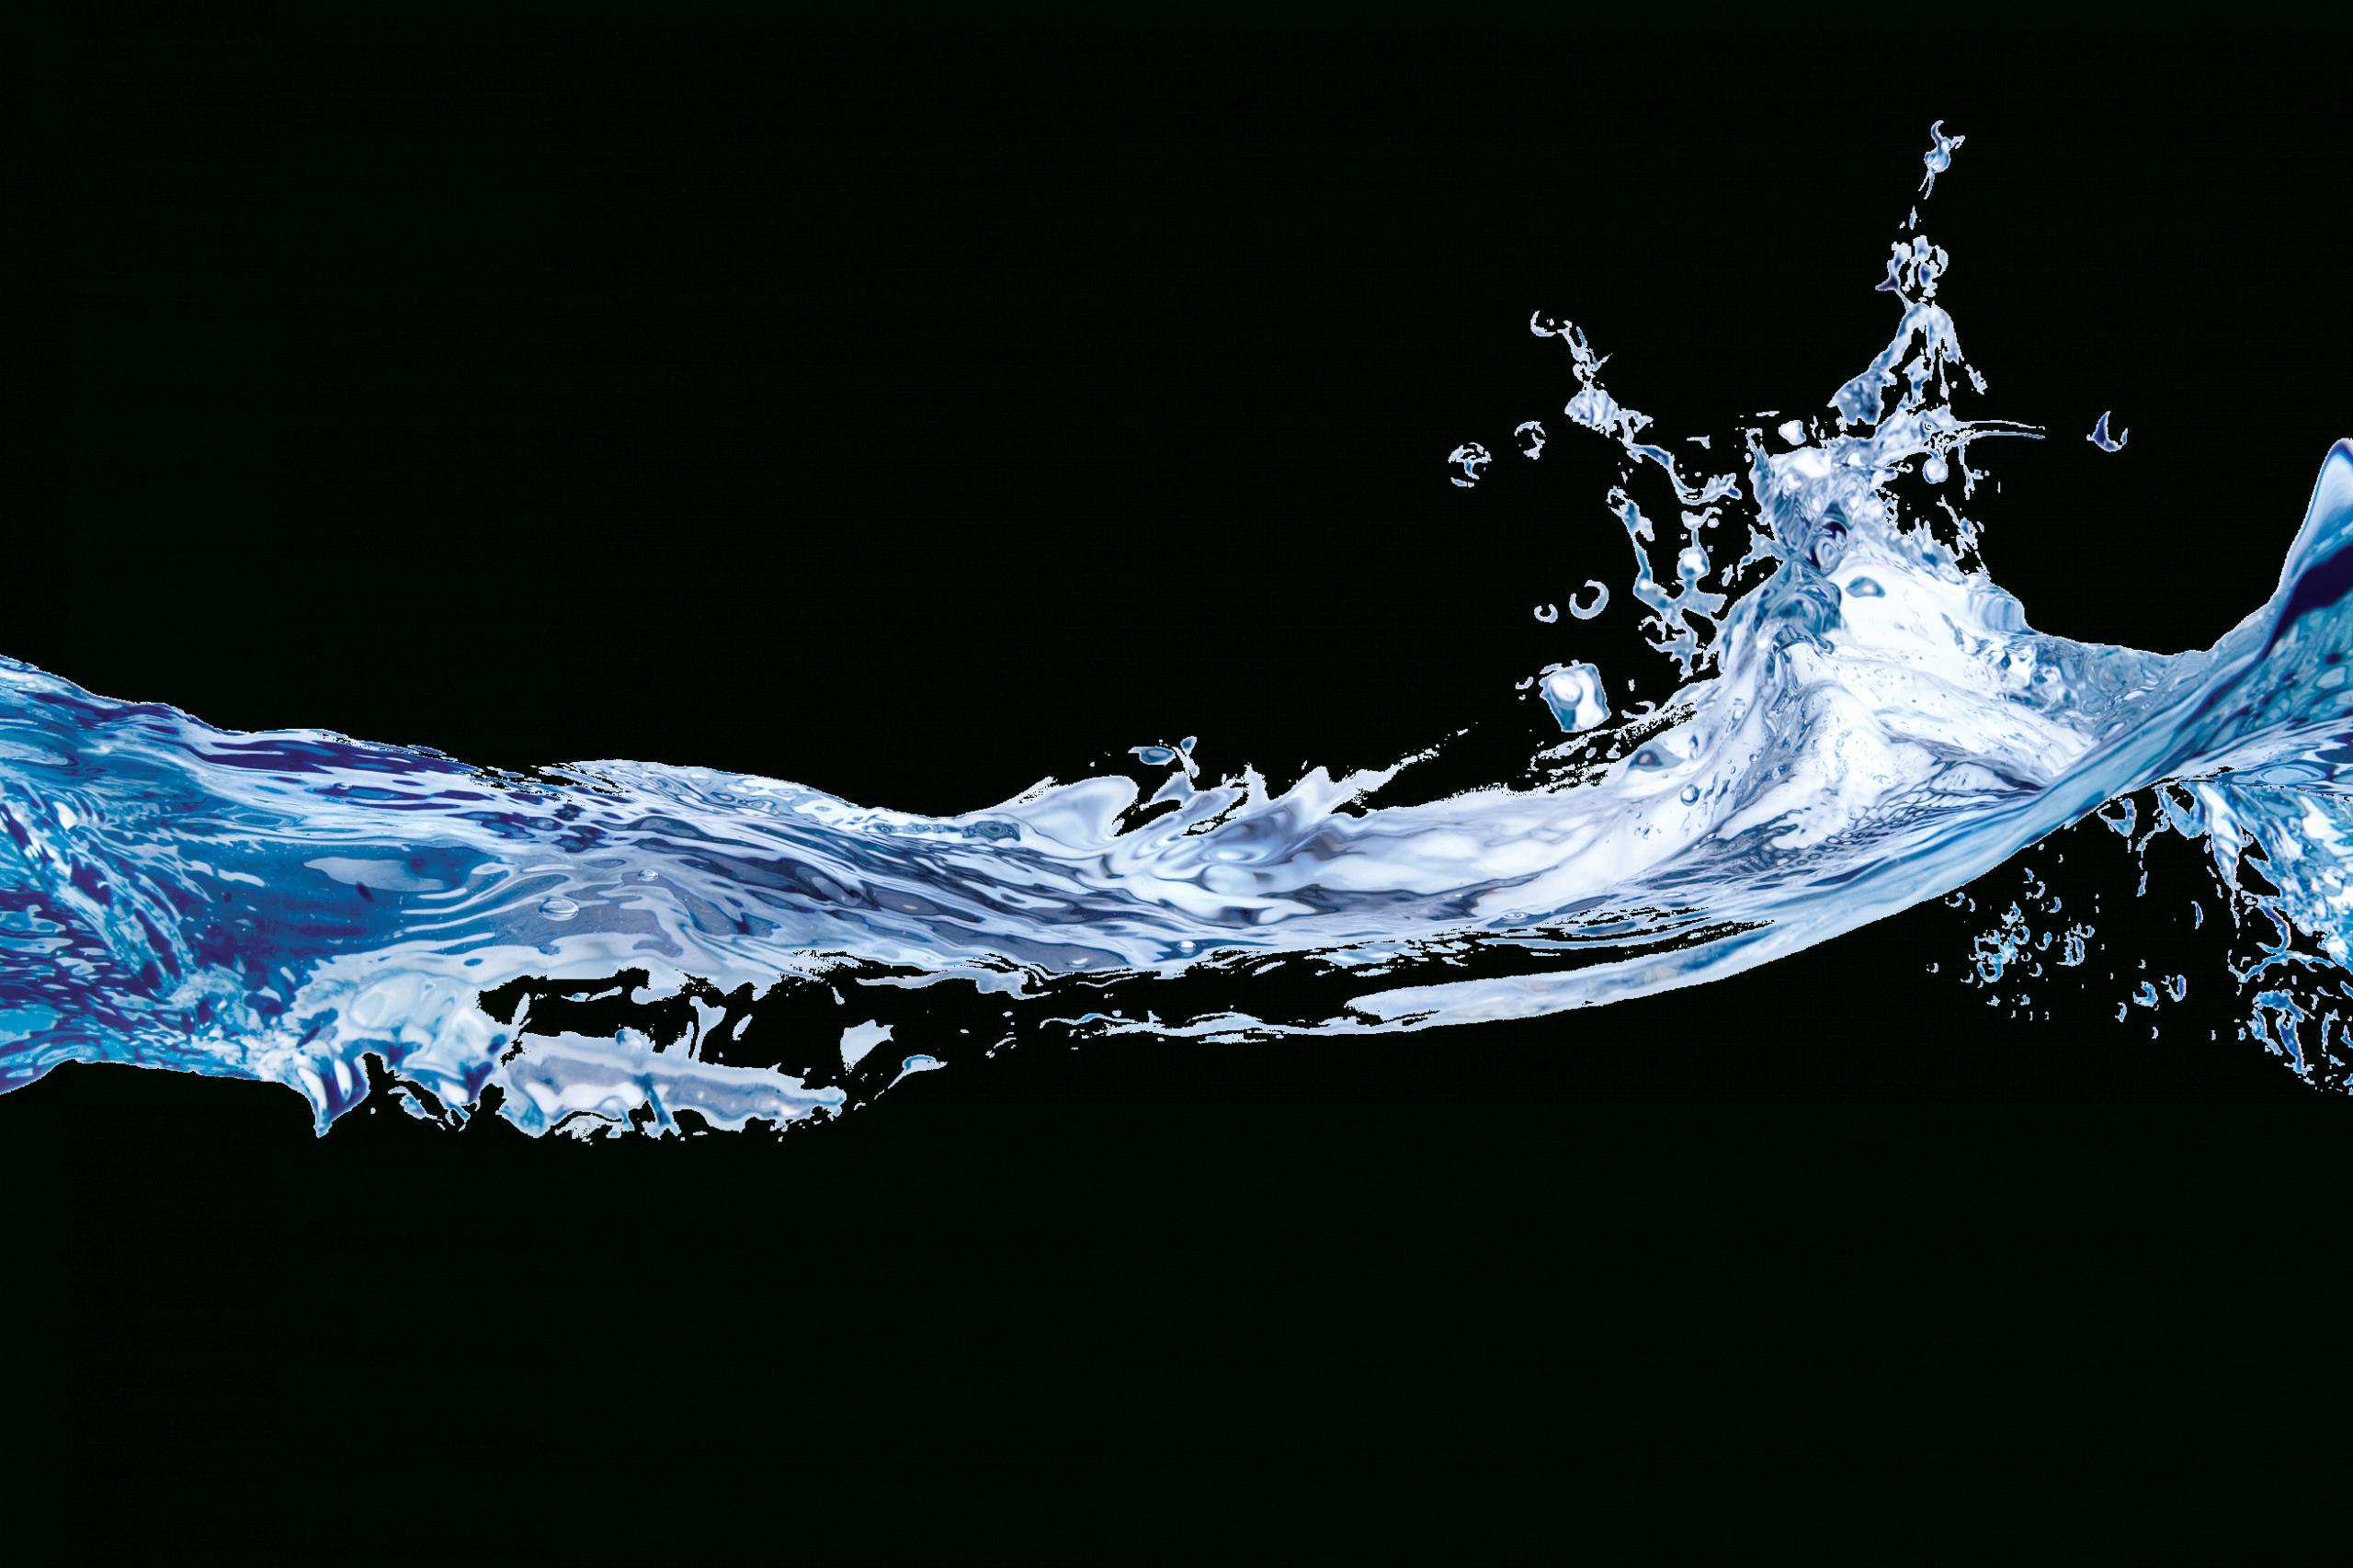 12 Blue Water Png Watercolor Splash Png Water Drop Drawing Watercolor Water